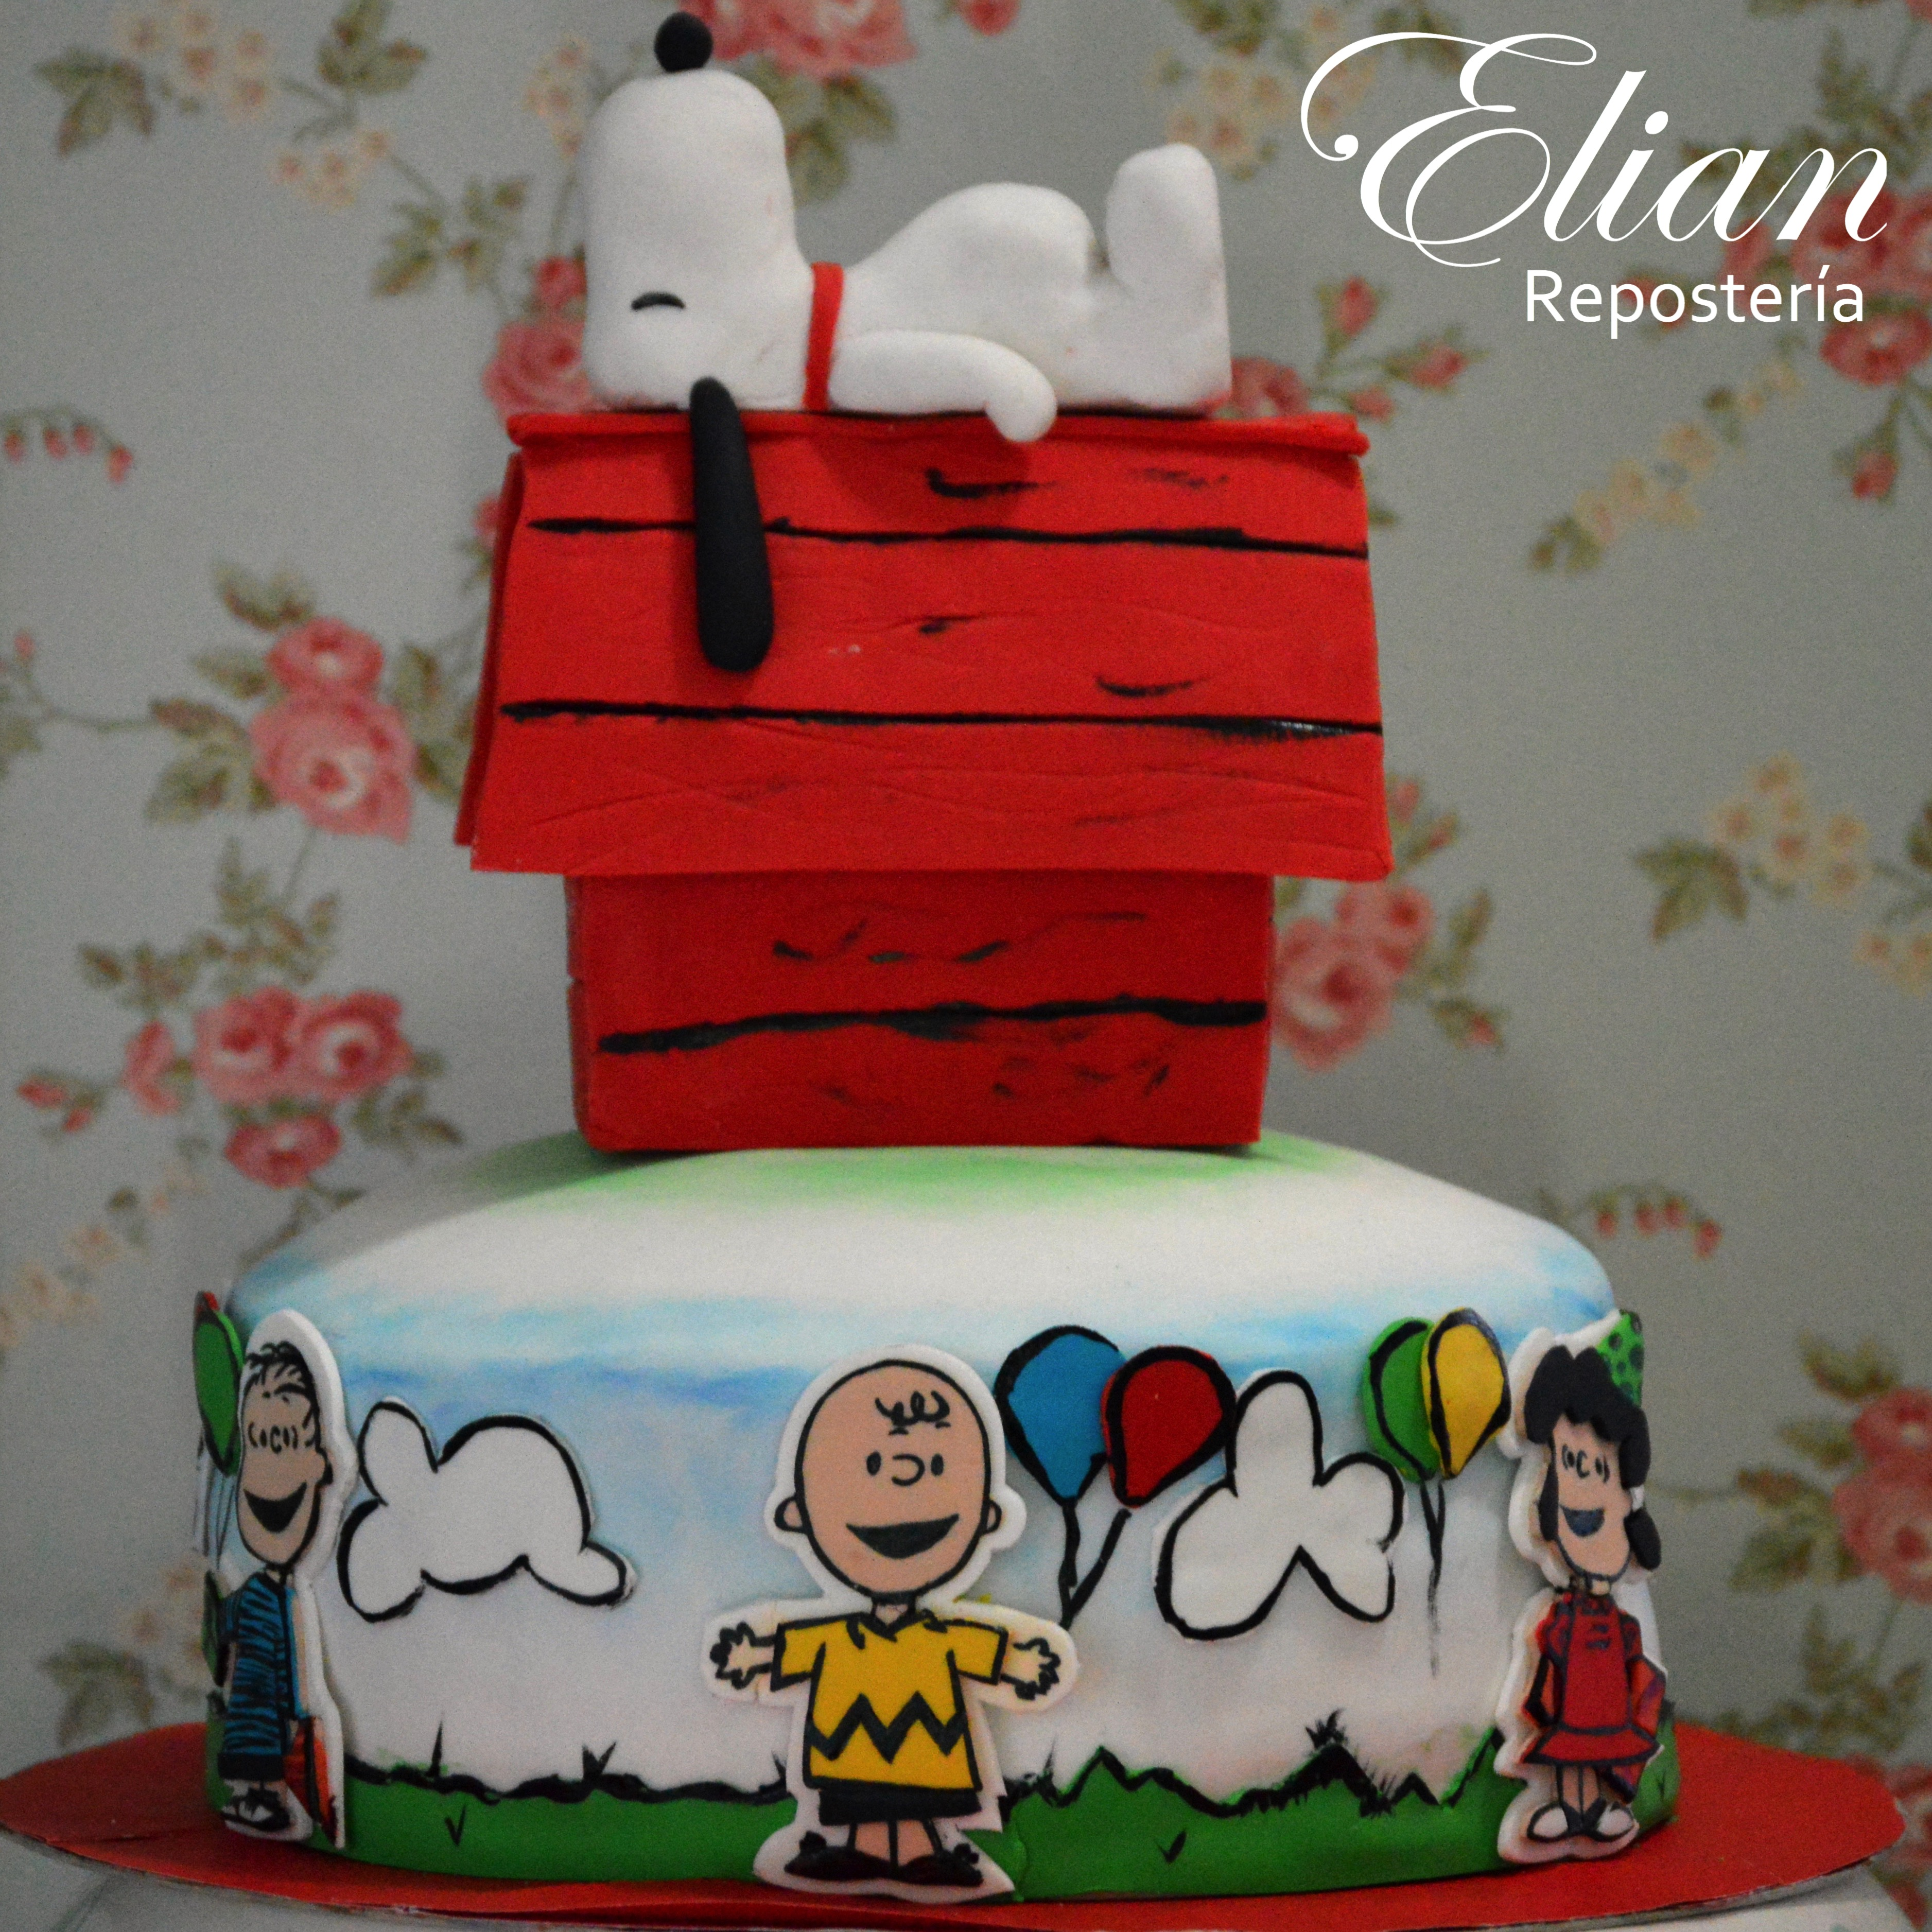 Peanuts Cake snoopy fondant